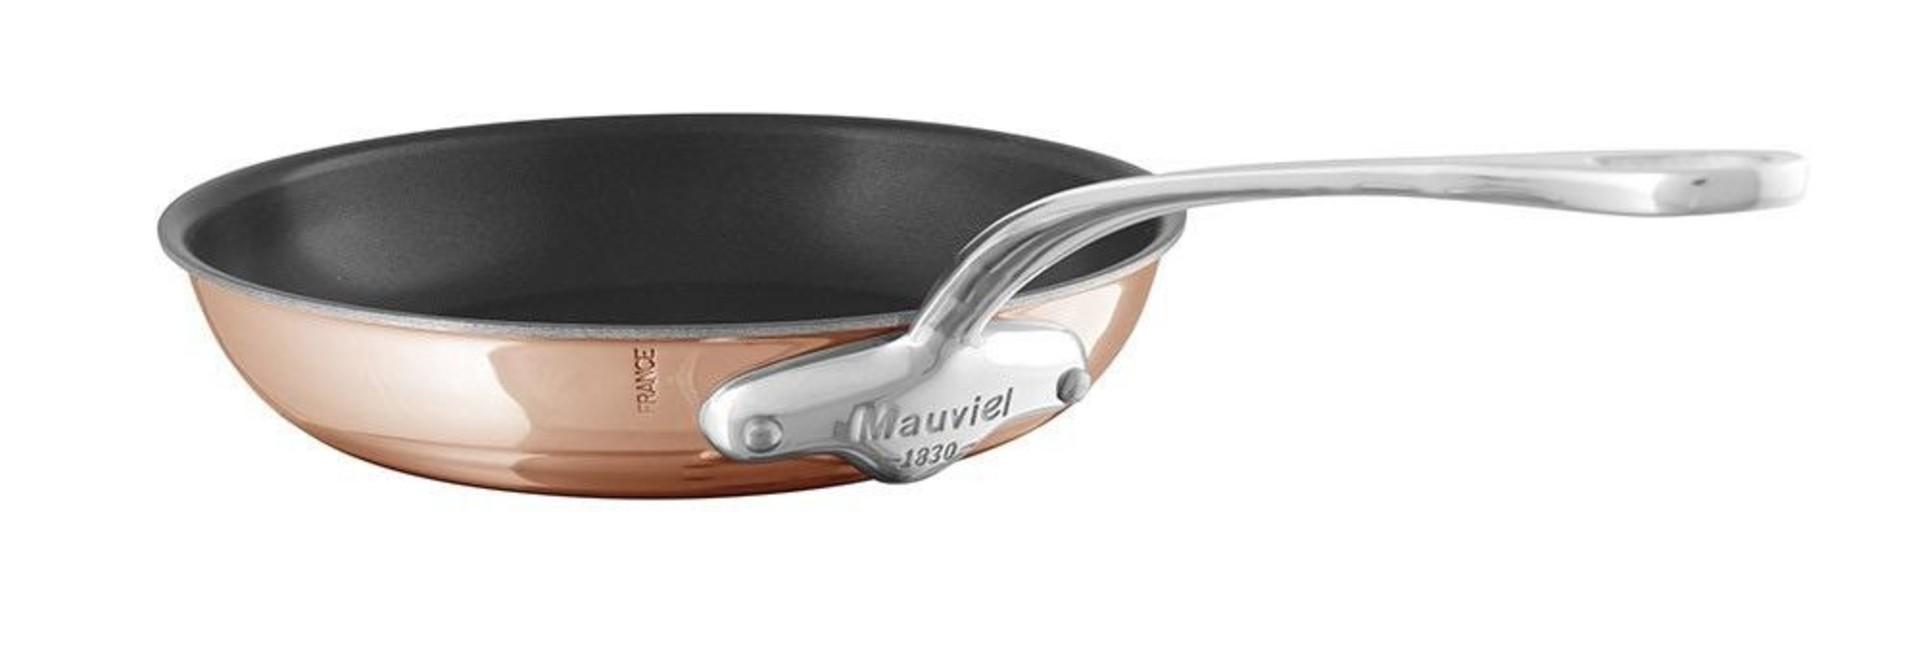 MAUVIEL - Copper Induction Frying Pan M'6s 30cm